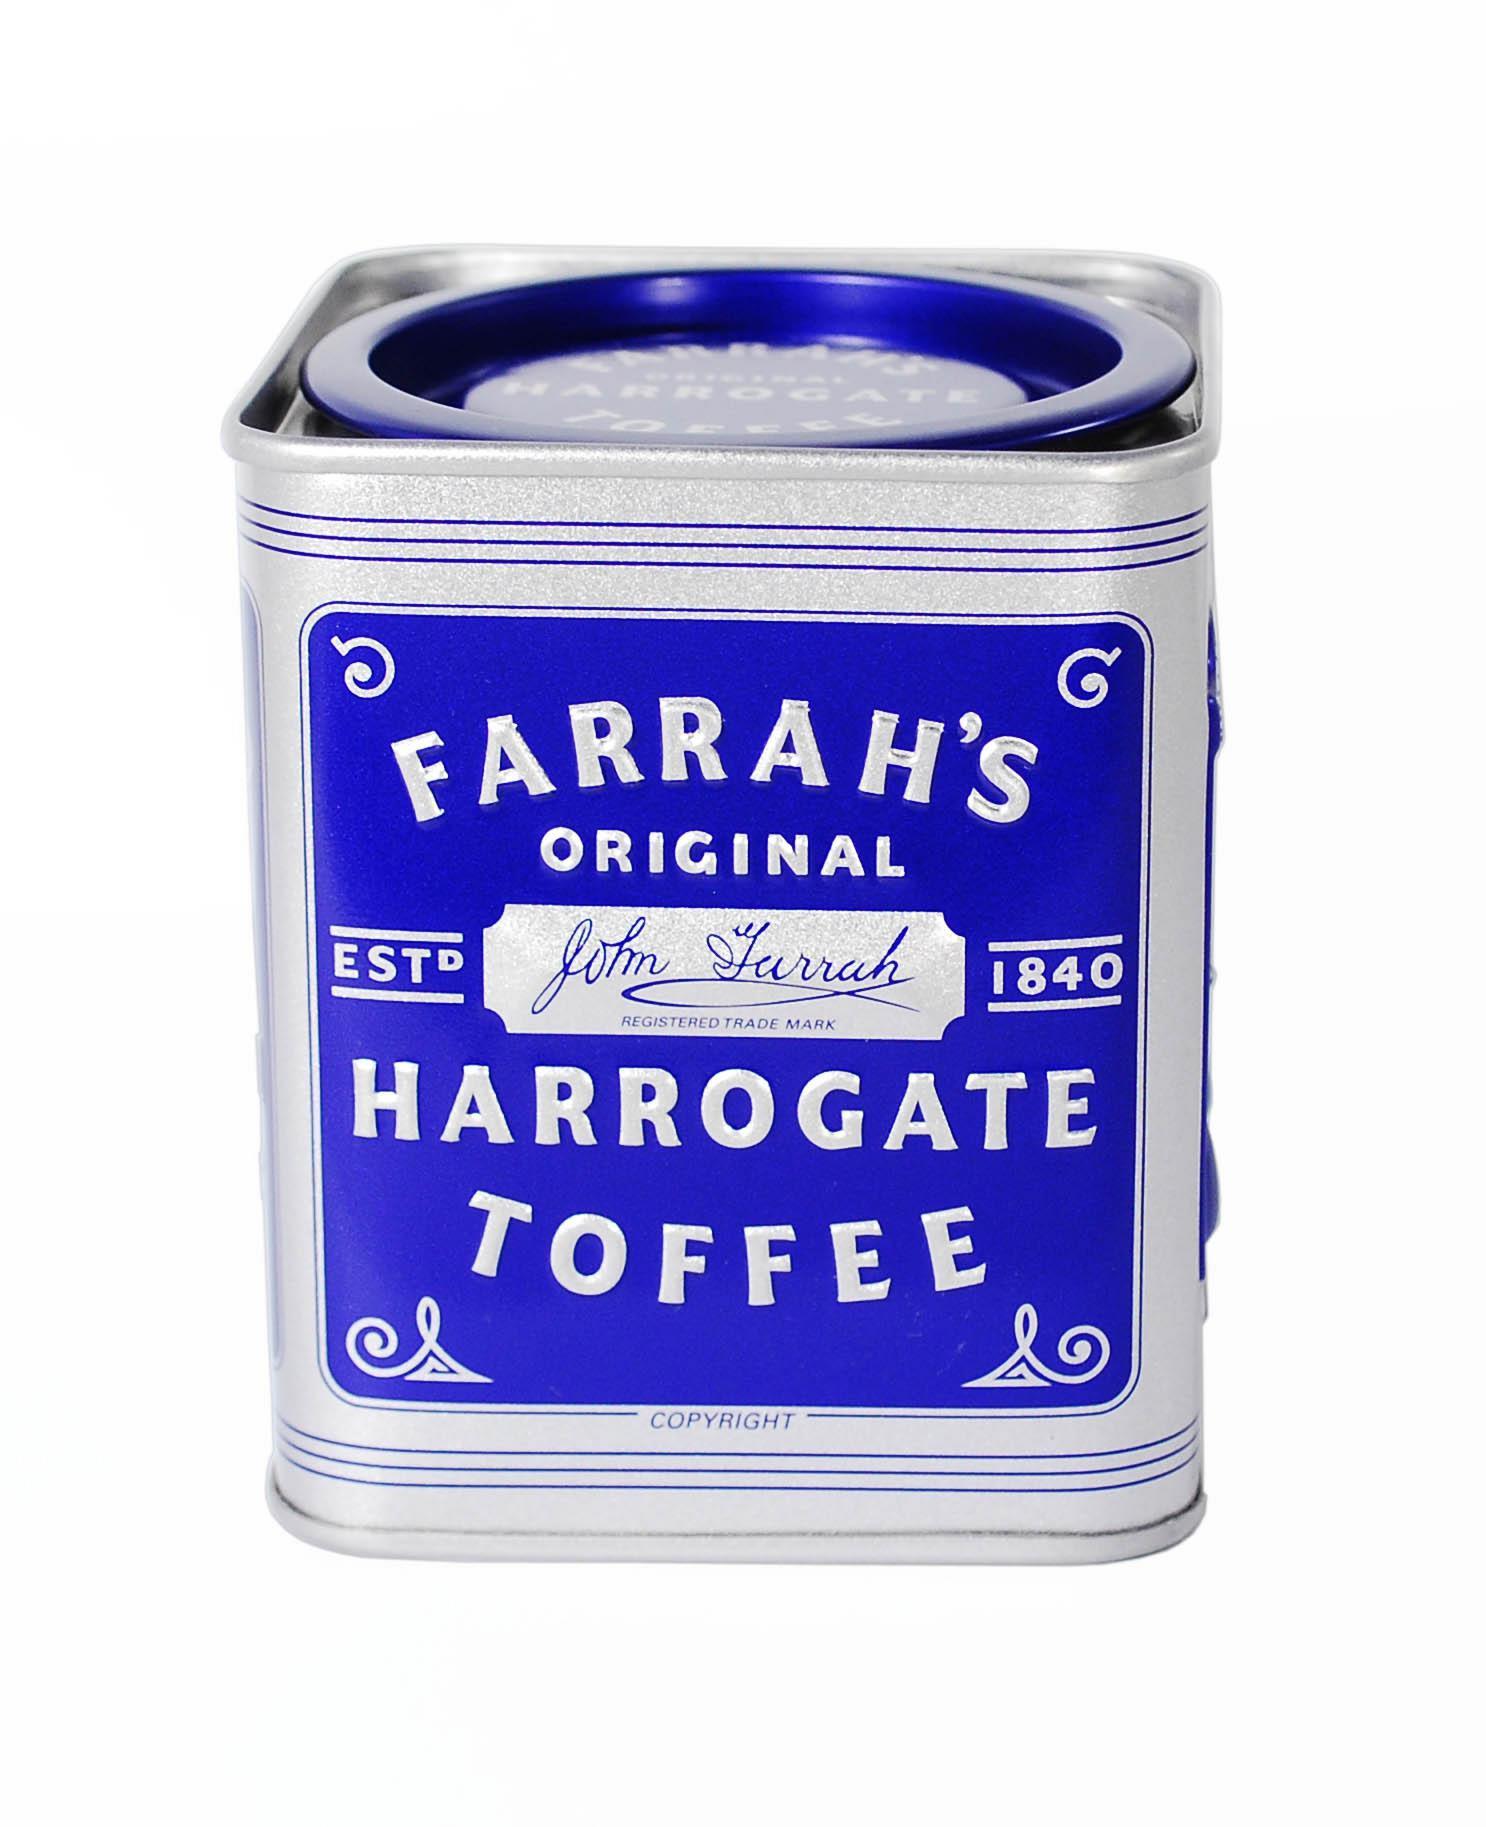 Farrah's of Harrogate Ltd